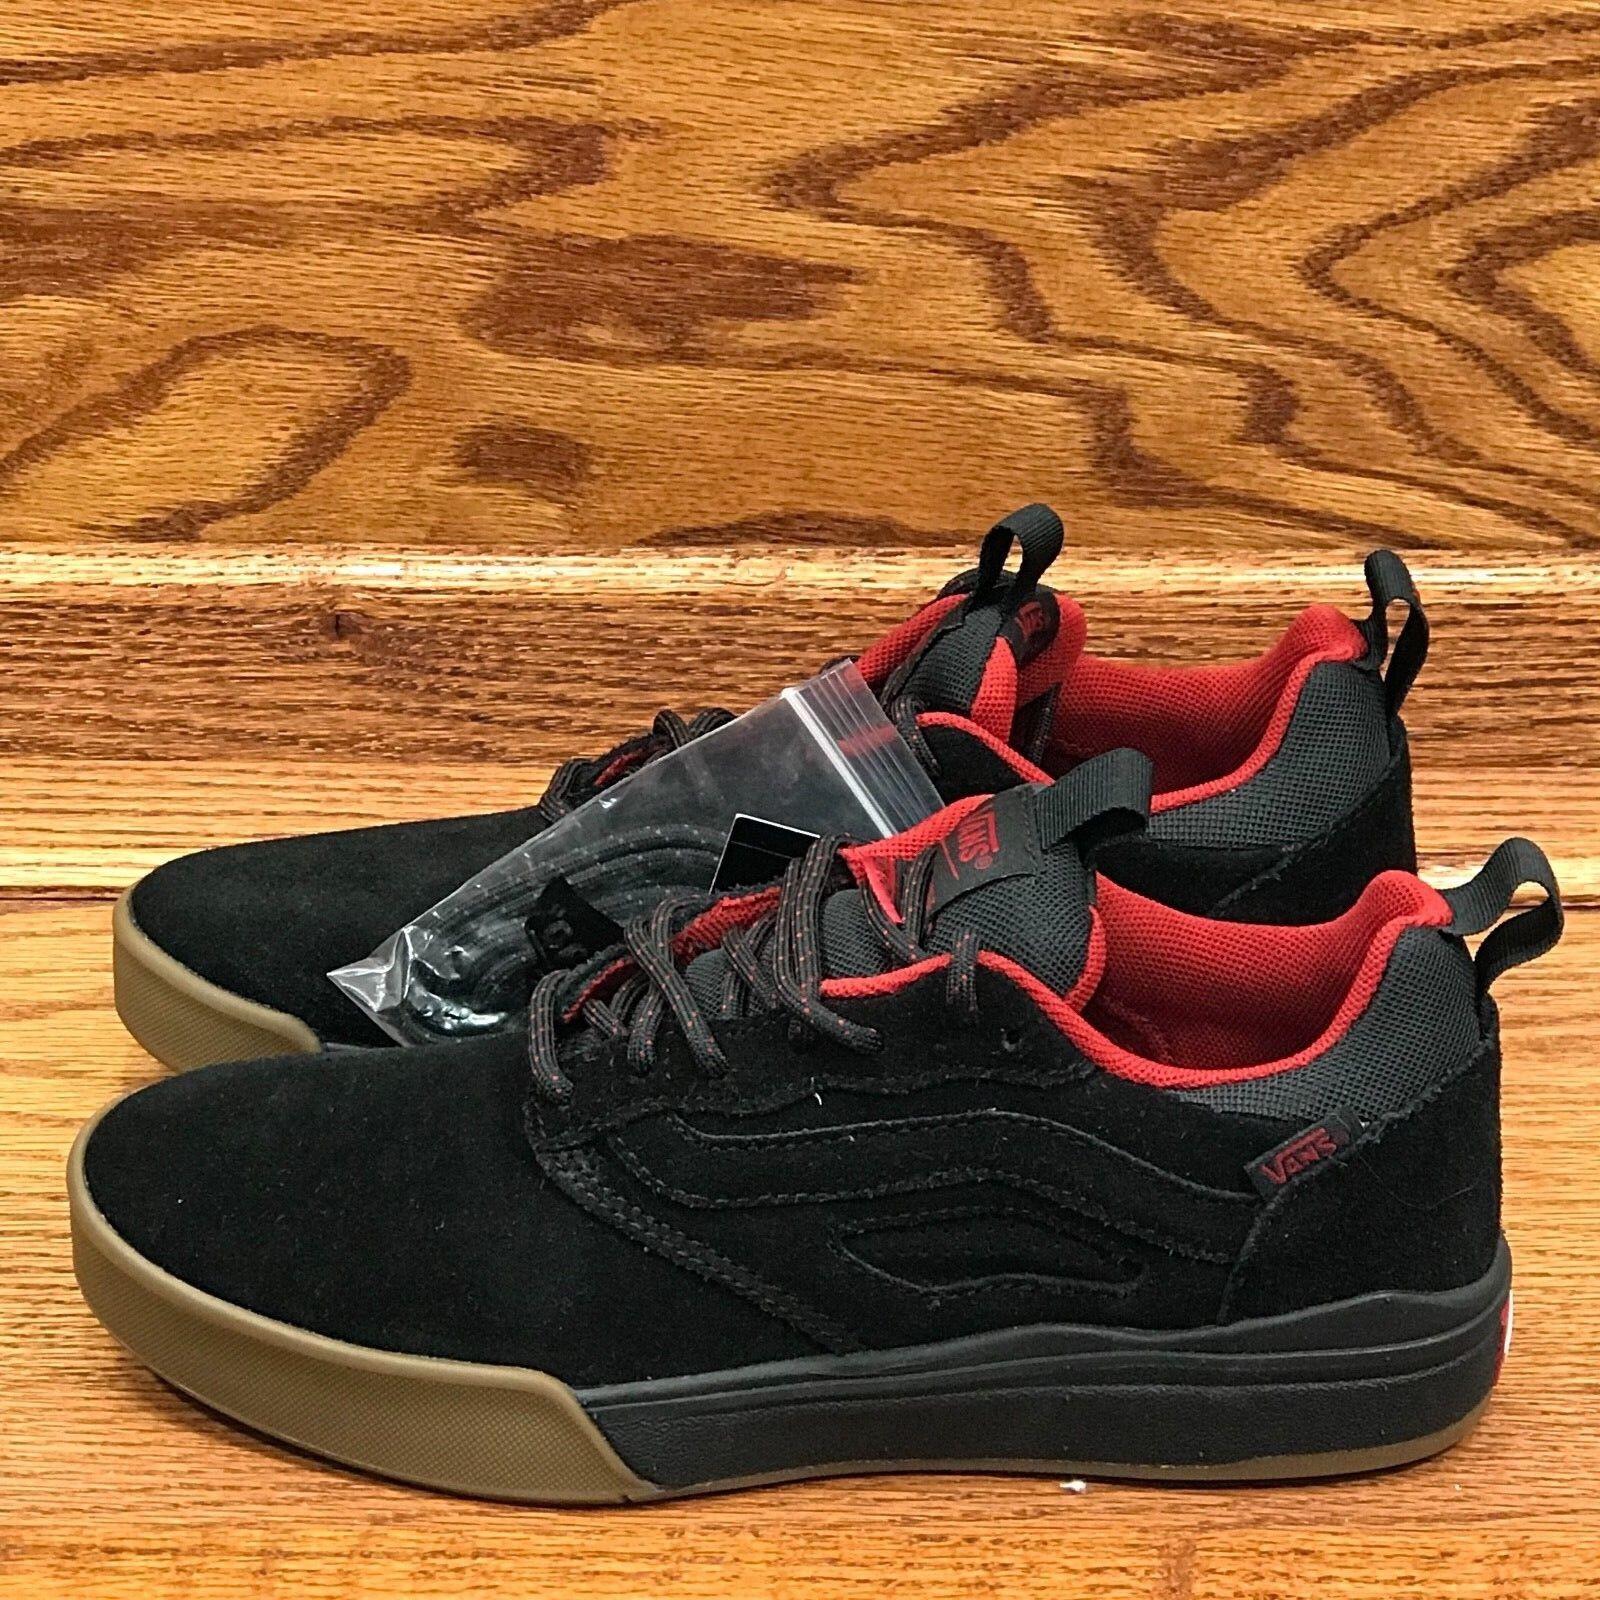 Vans UltraRange Pro Spitfire Cardiel Zapatos Negros